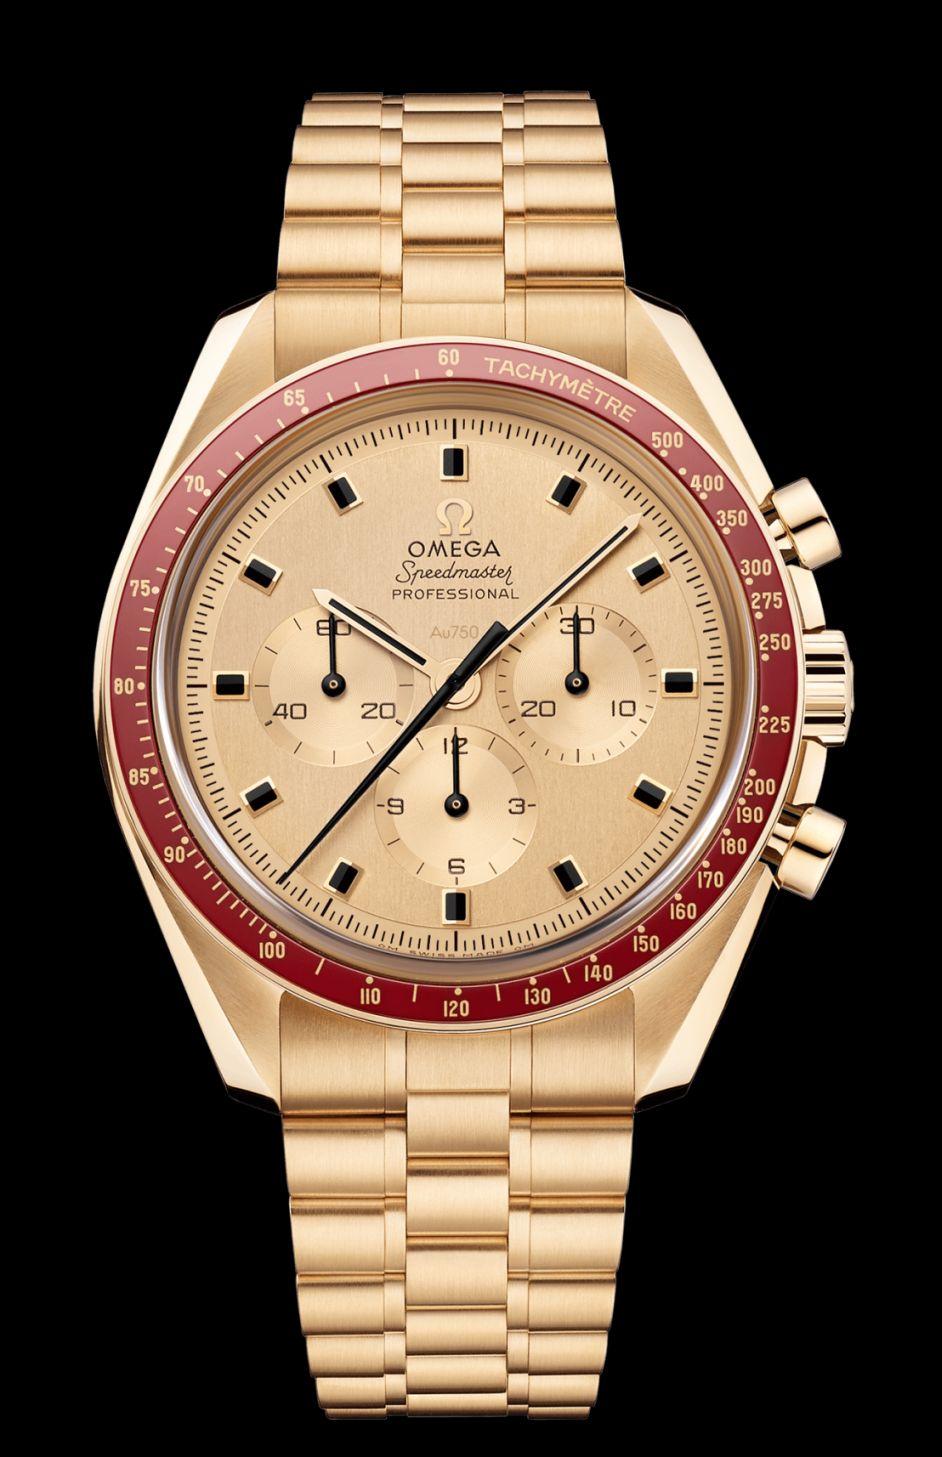 Speedmaster-50th, Omega Speedmaster Moonwatch Apollo 11 50th Anniversary, 310.60.42.50.99.001